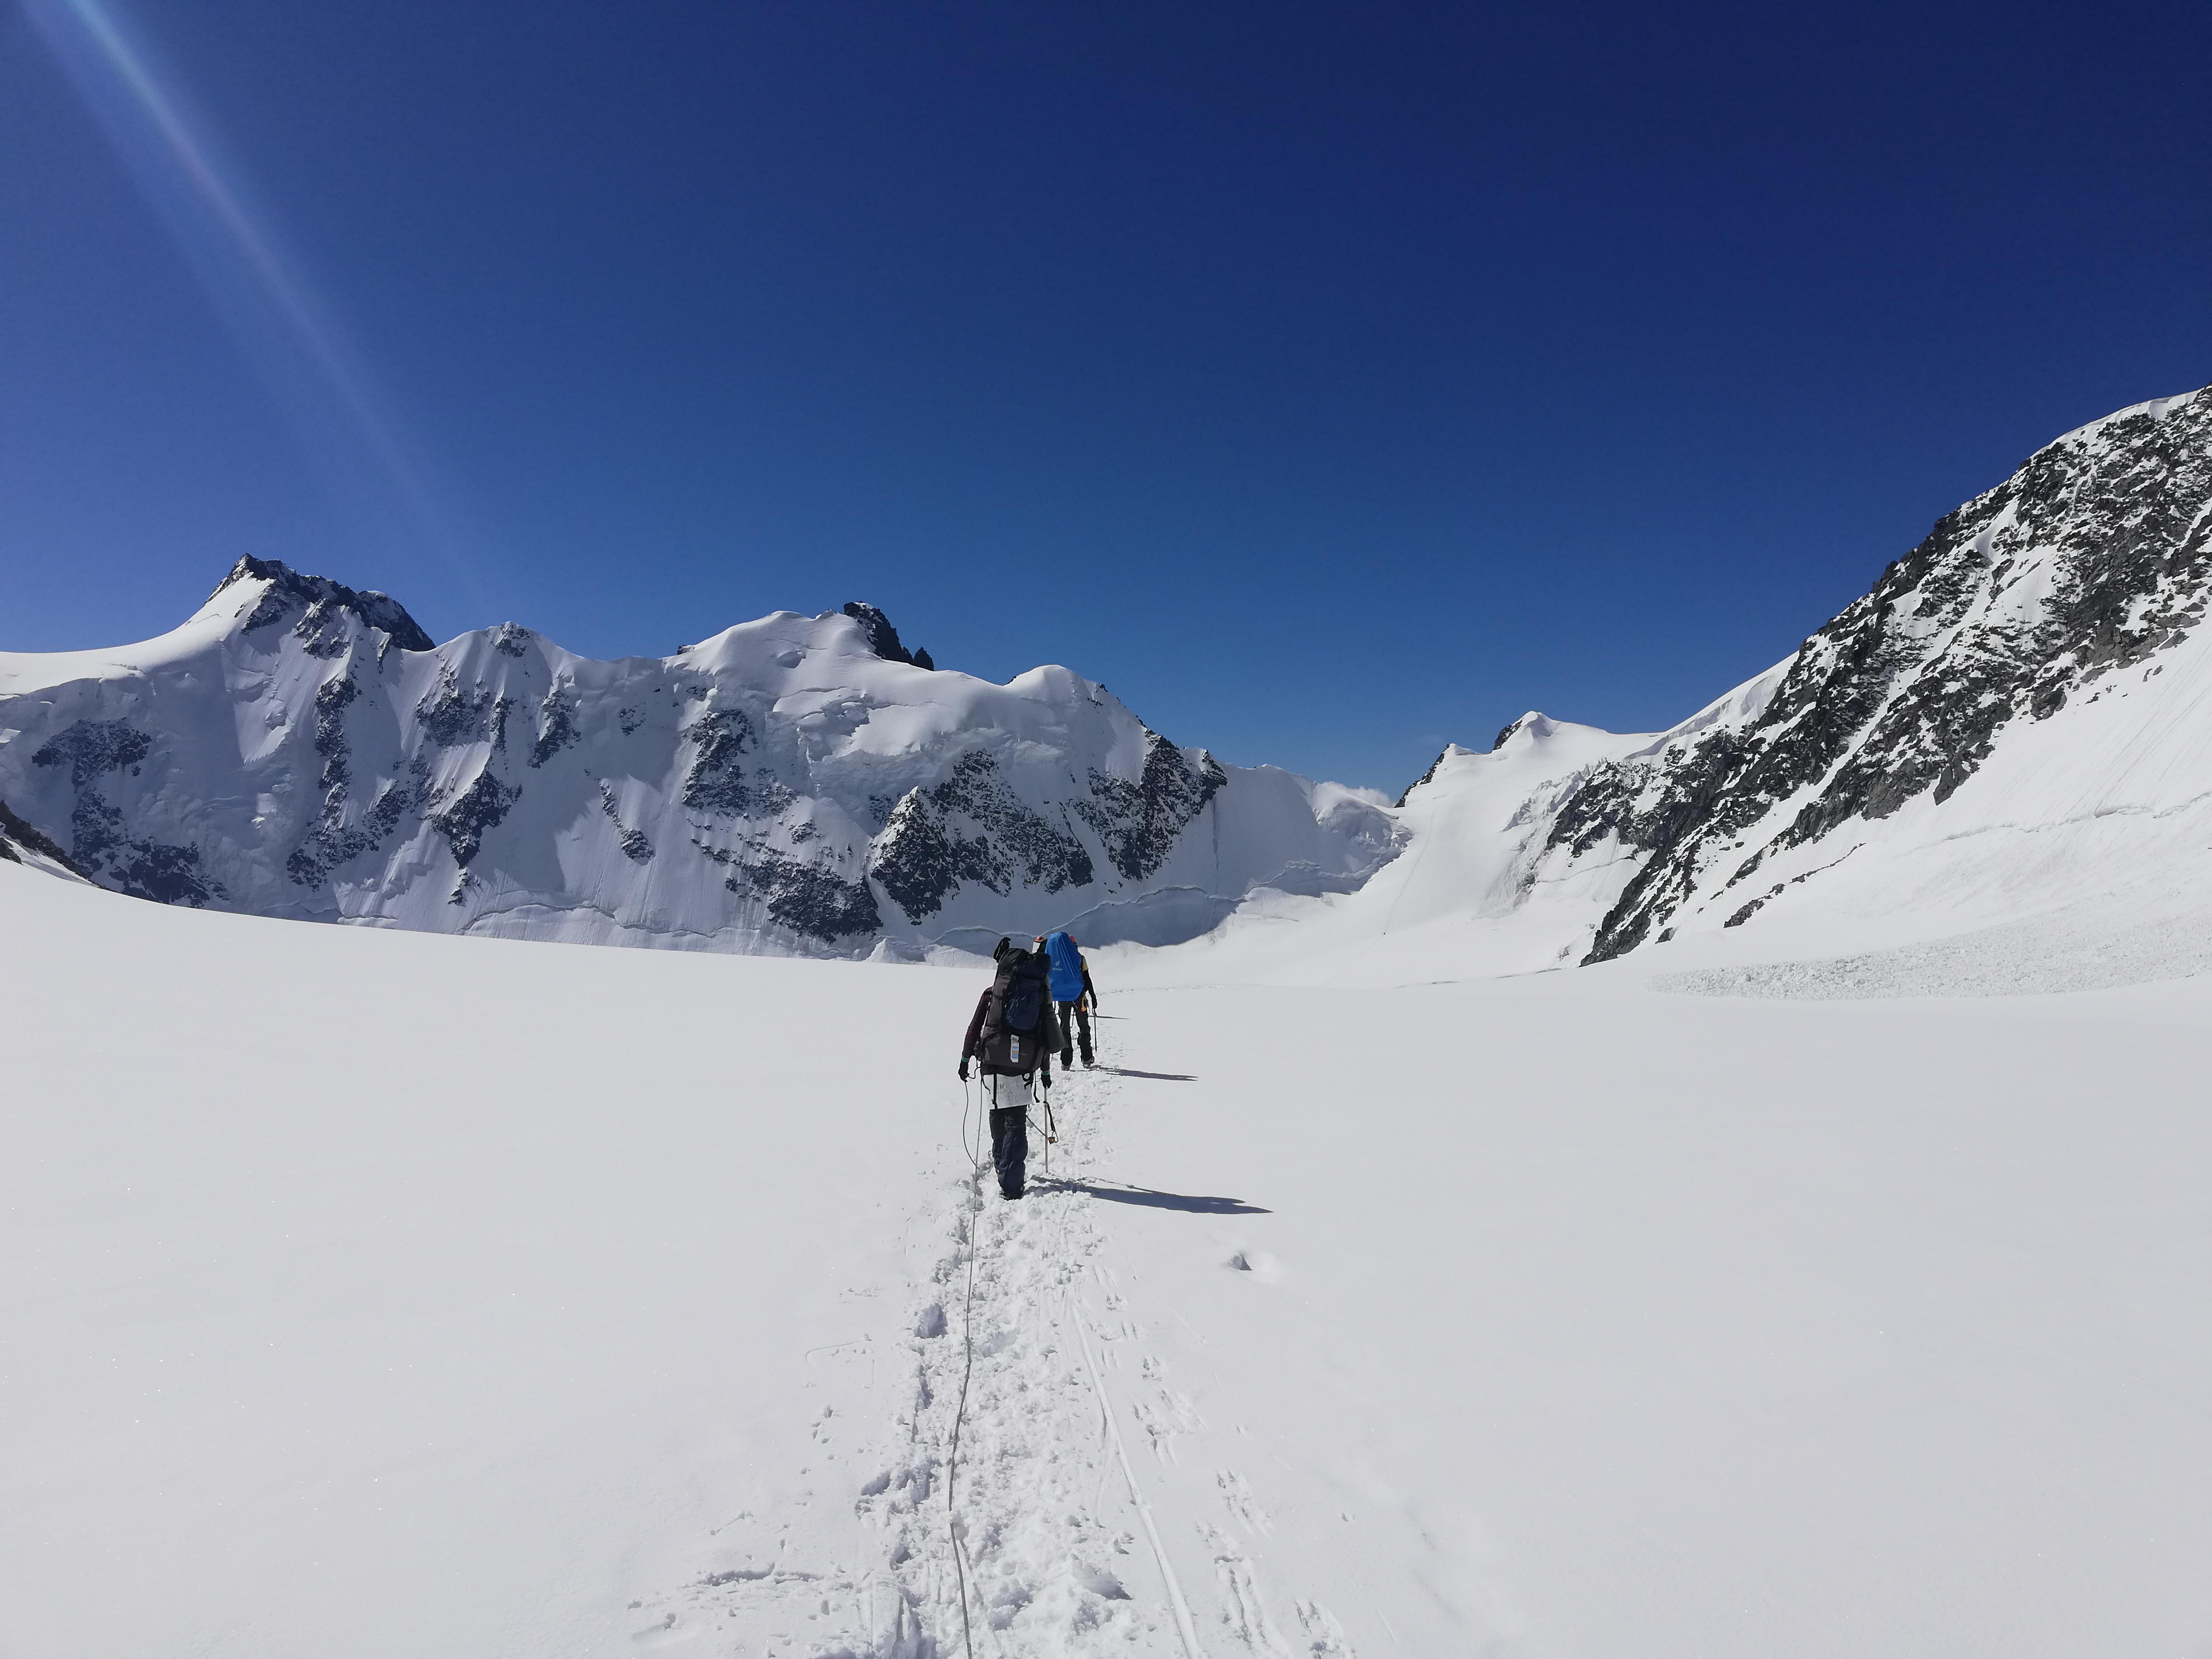 ледник менсу фото